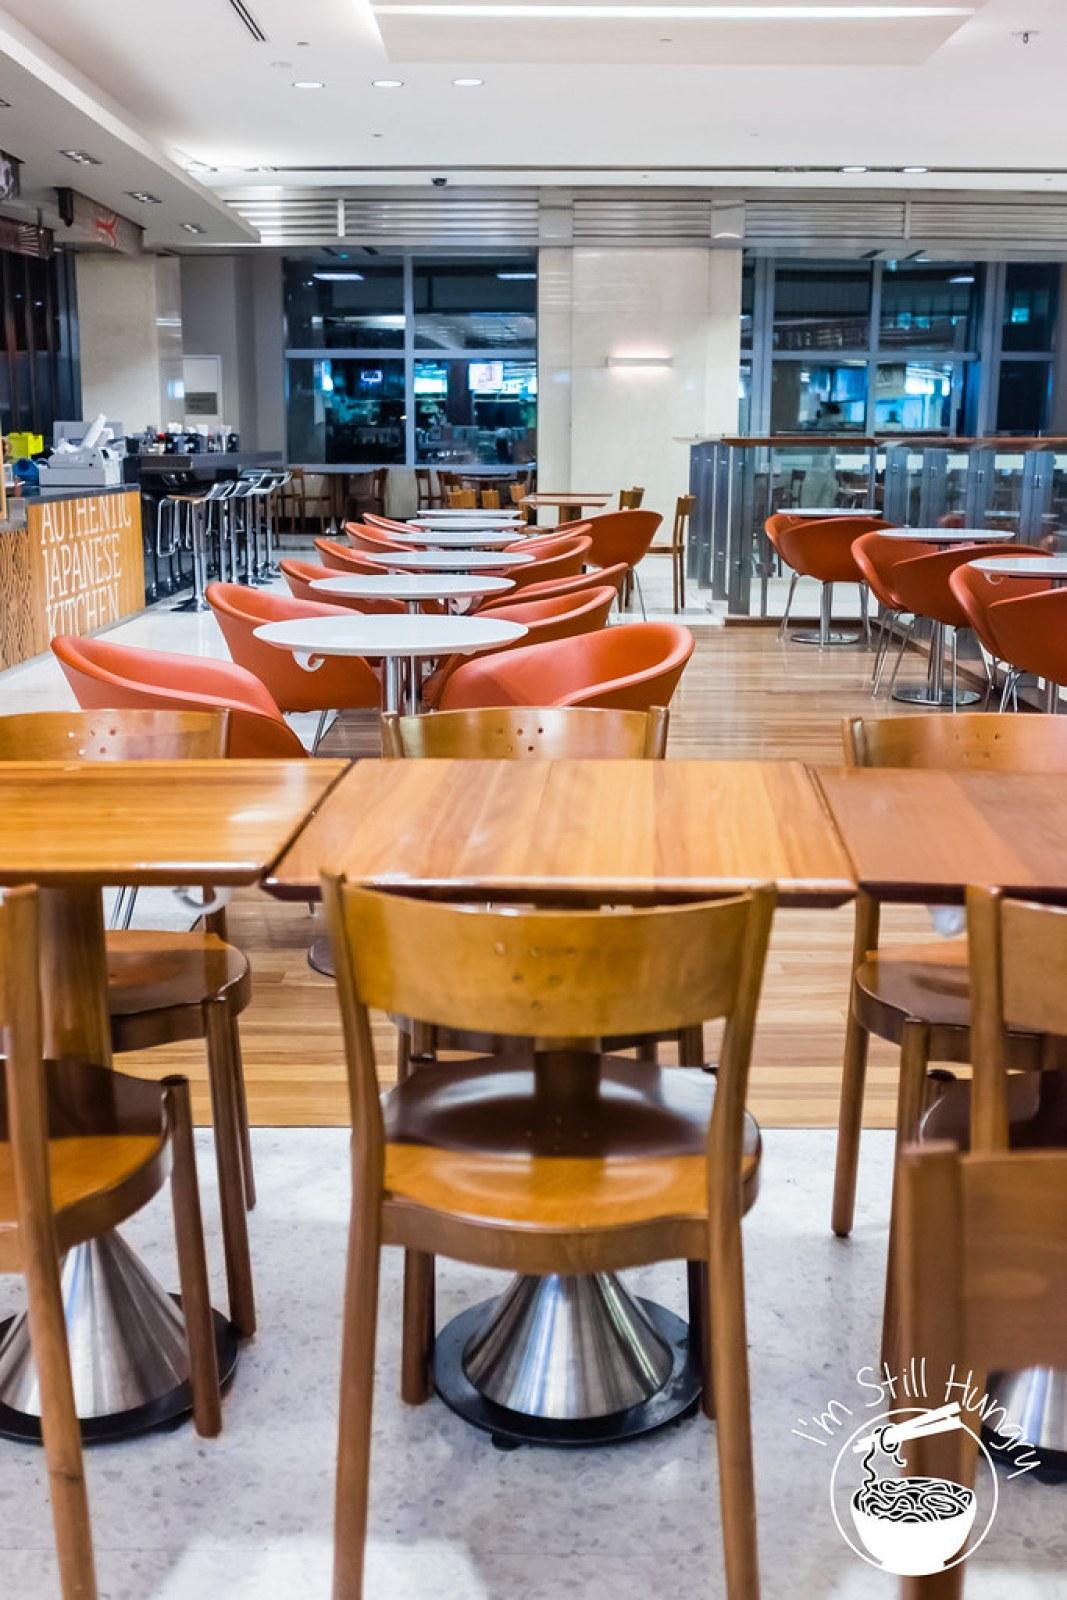 Azuma Chifley food court